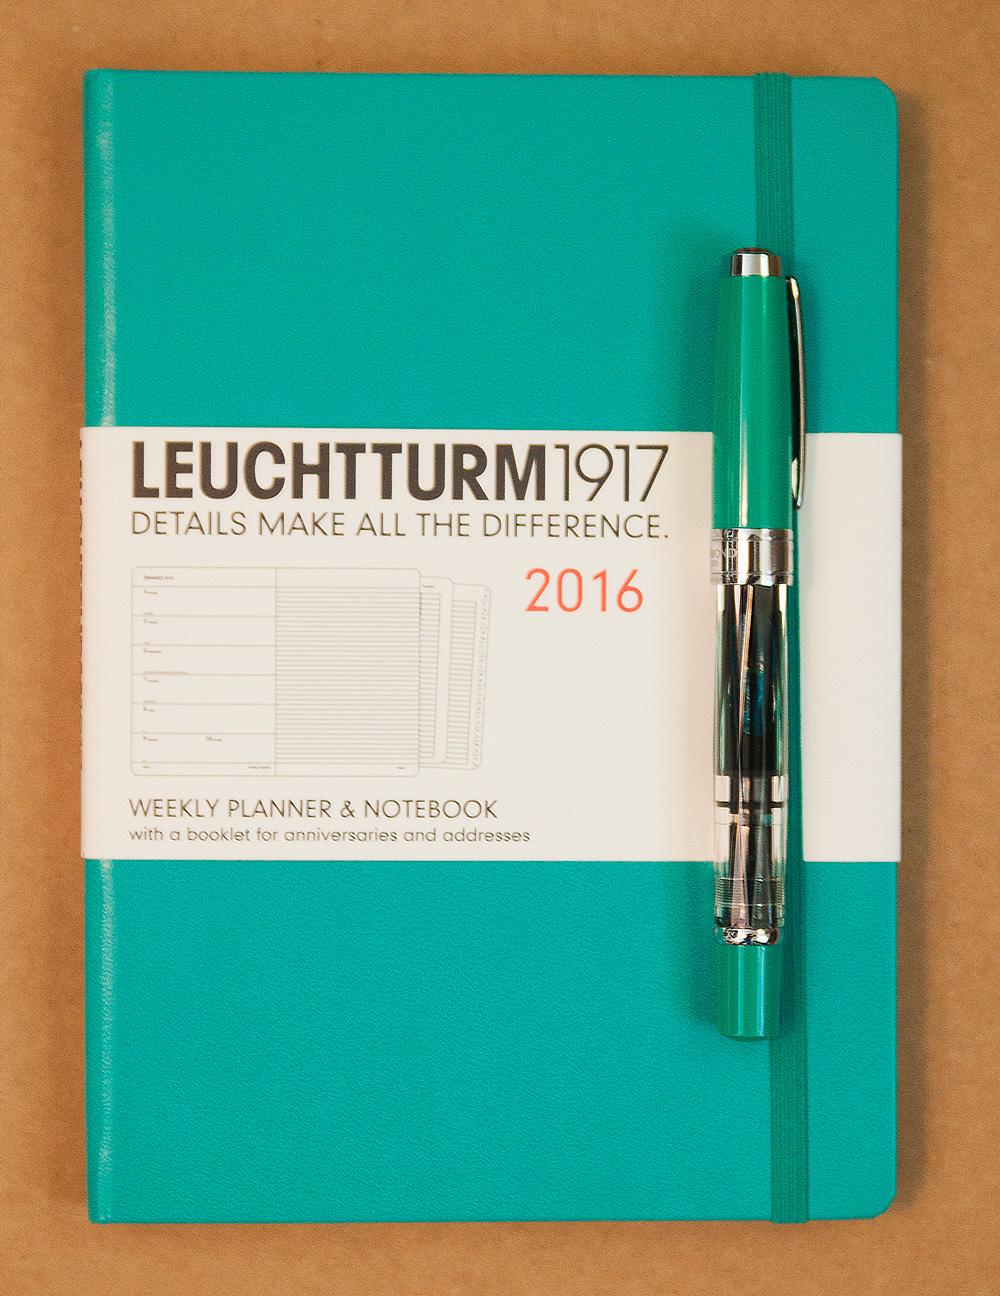 Planner Review Leuchtturm1917 2016 Planner  The Well